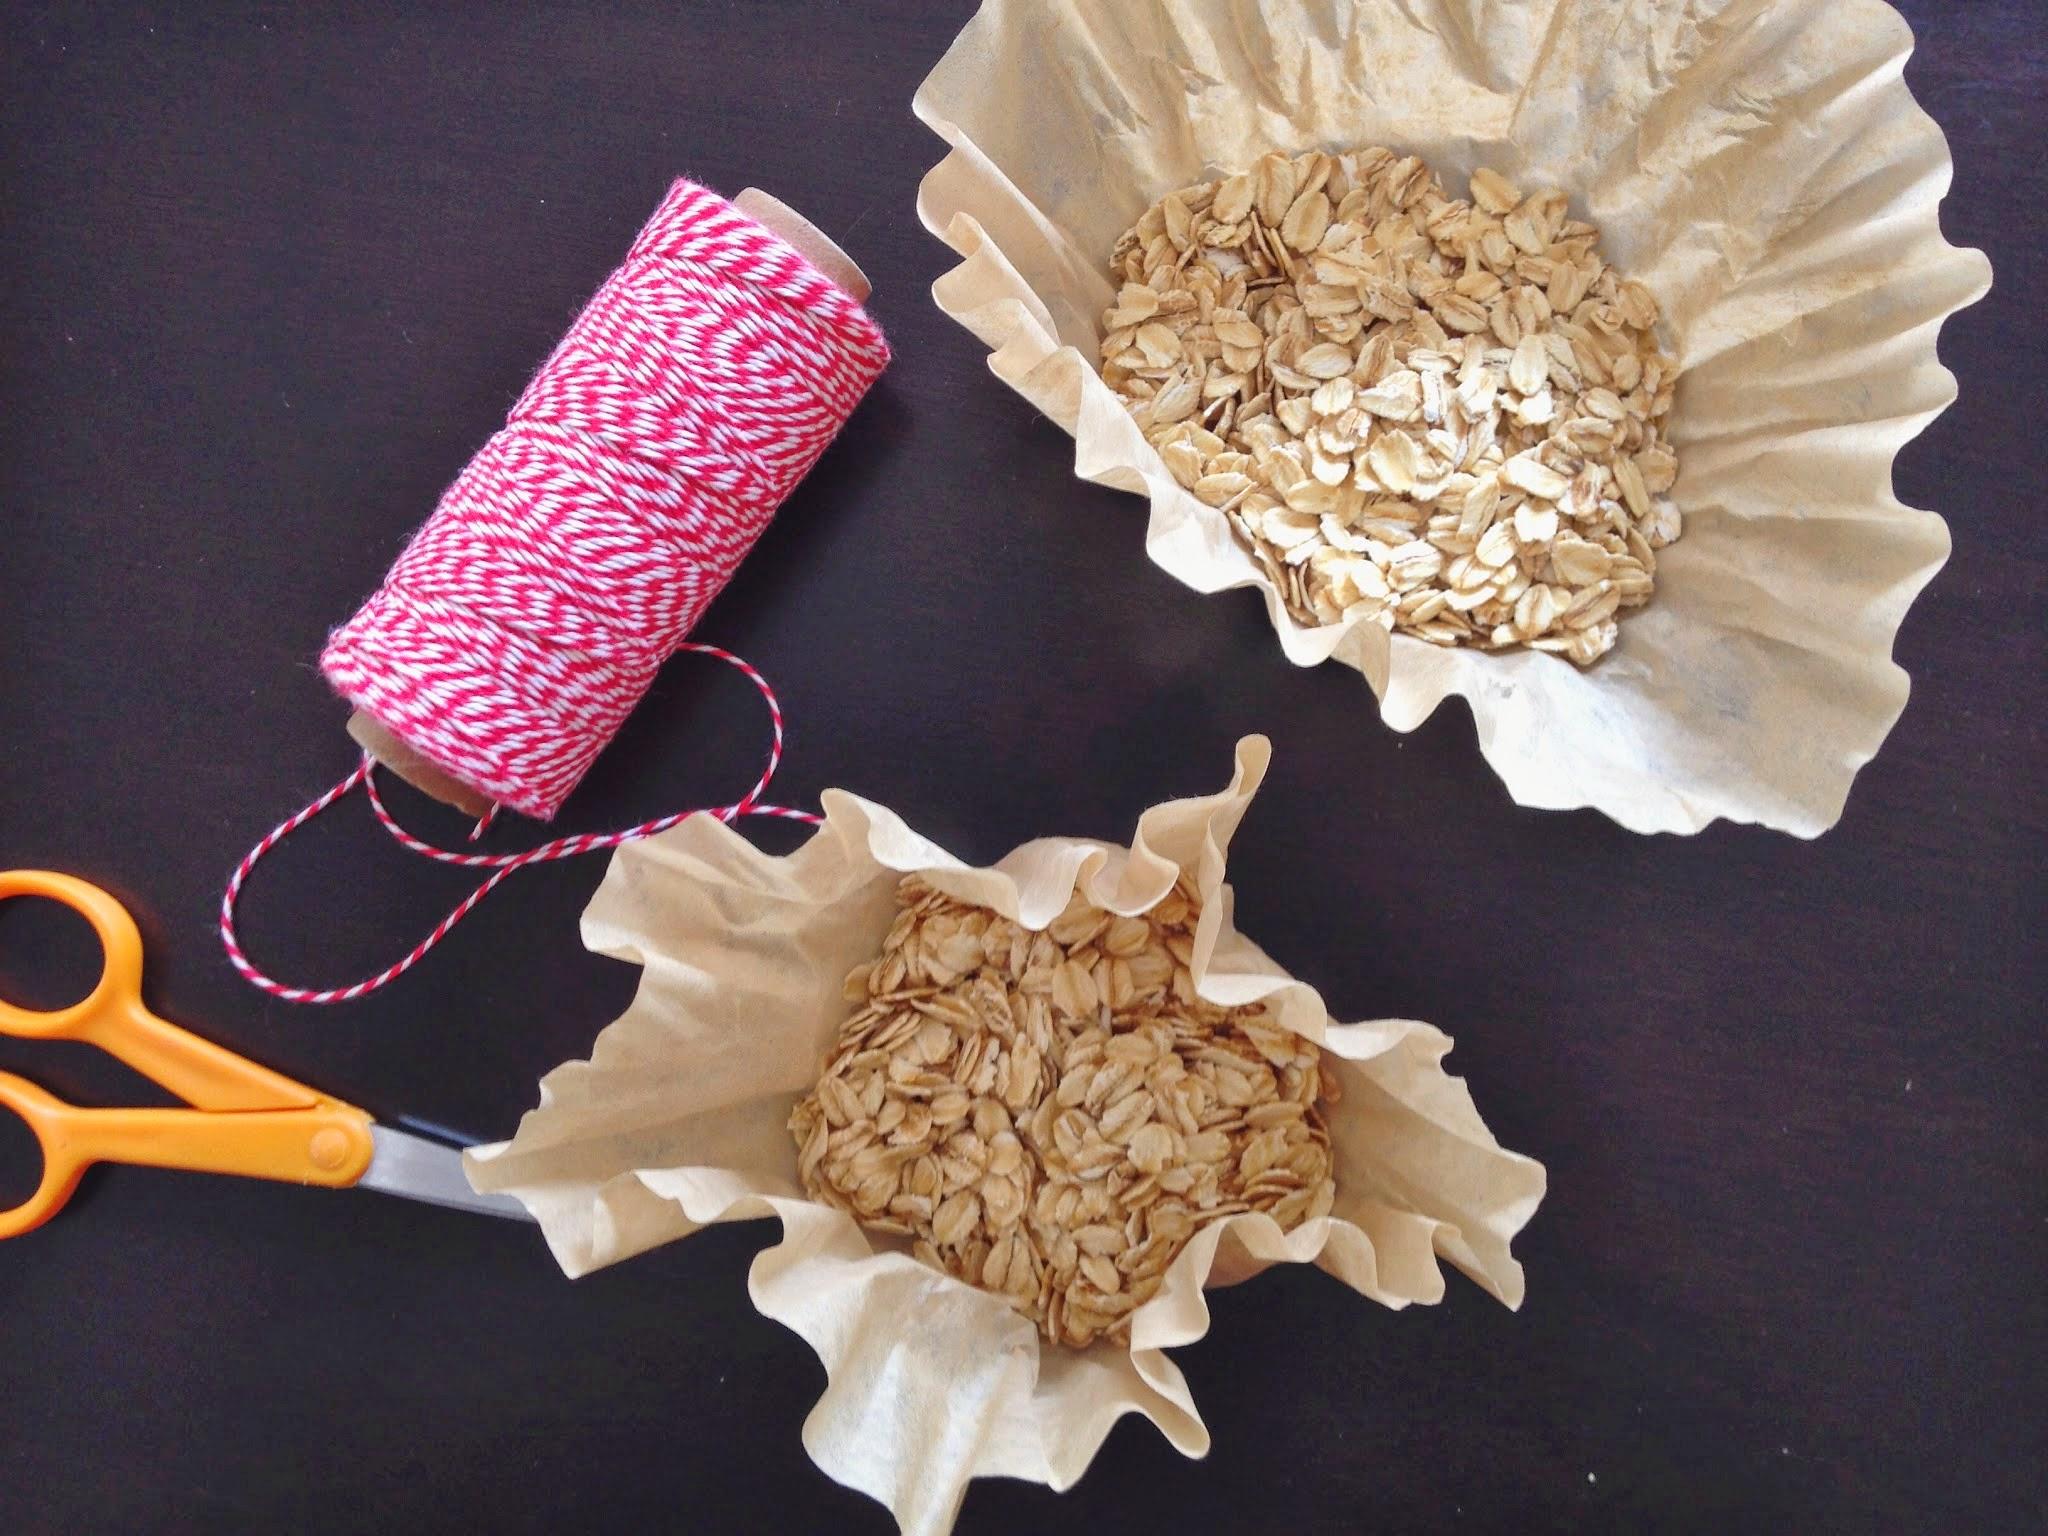 twine+to+tie+oats+in+bags.jpeg